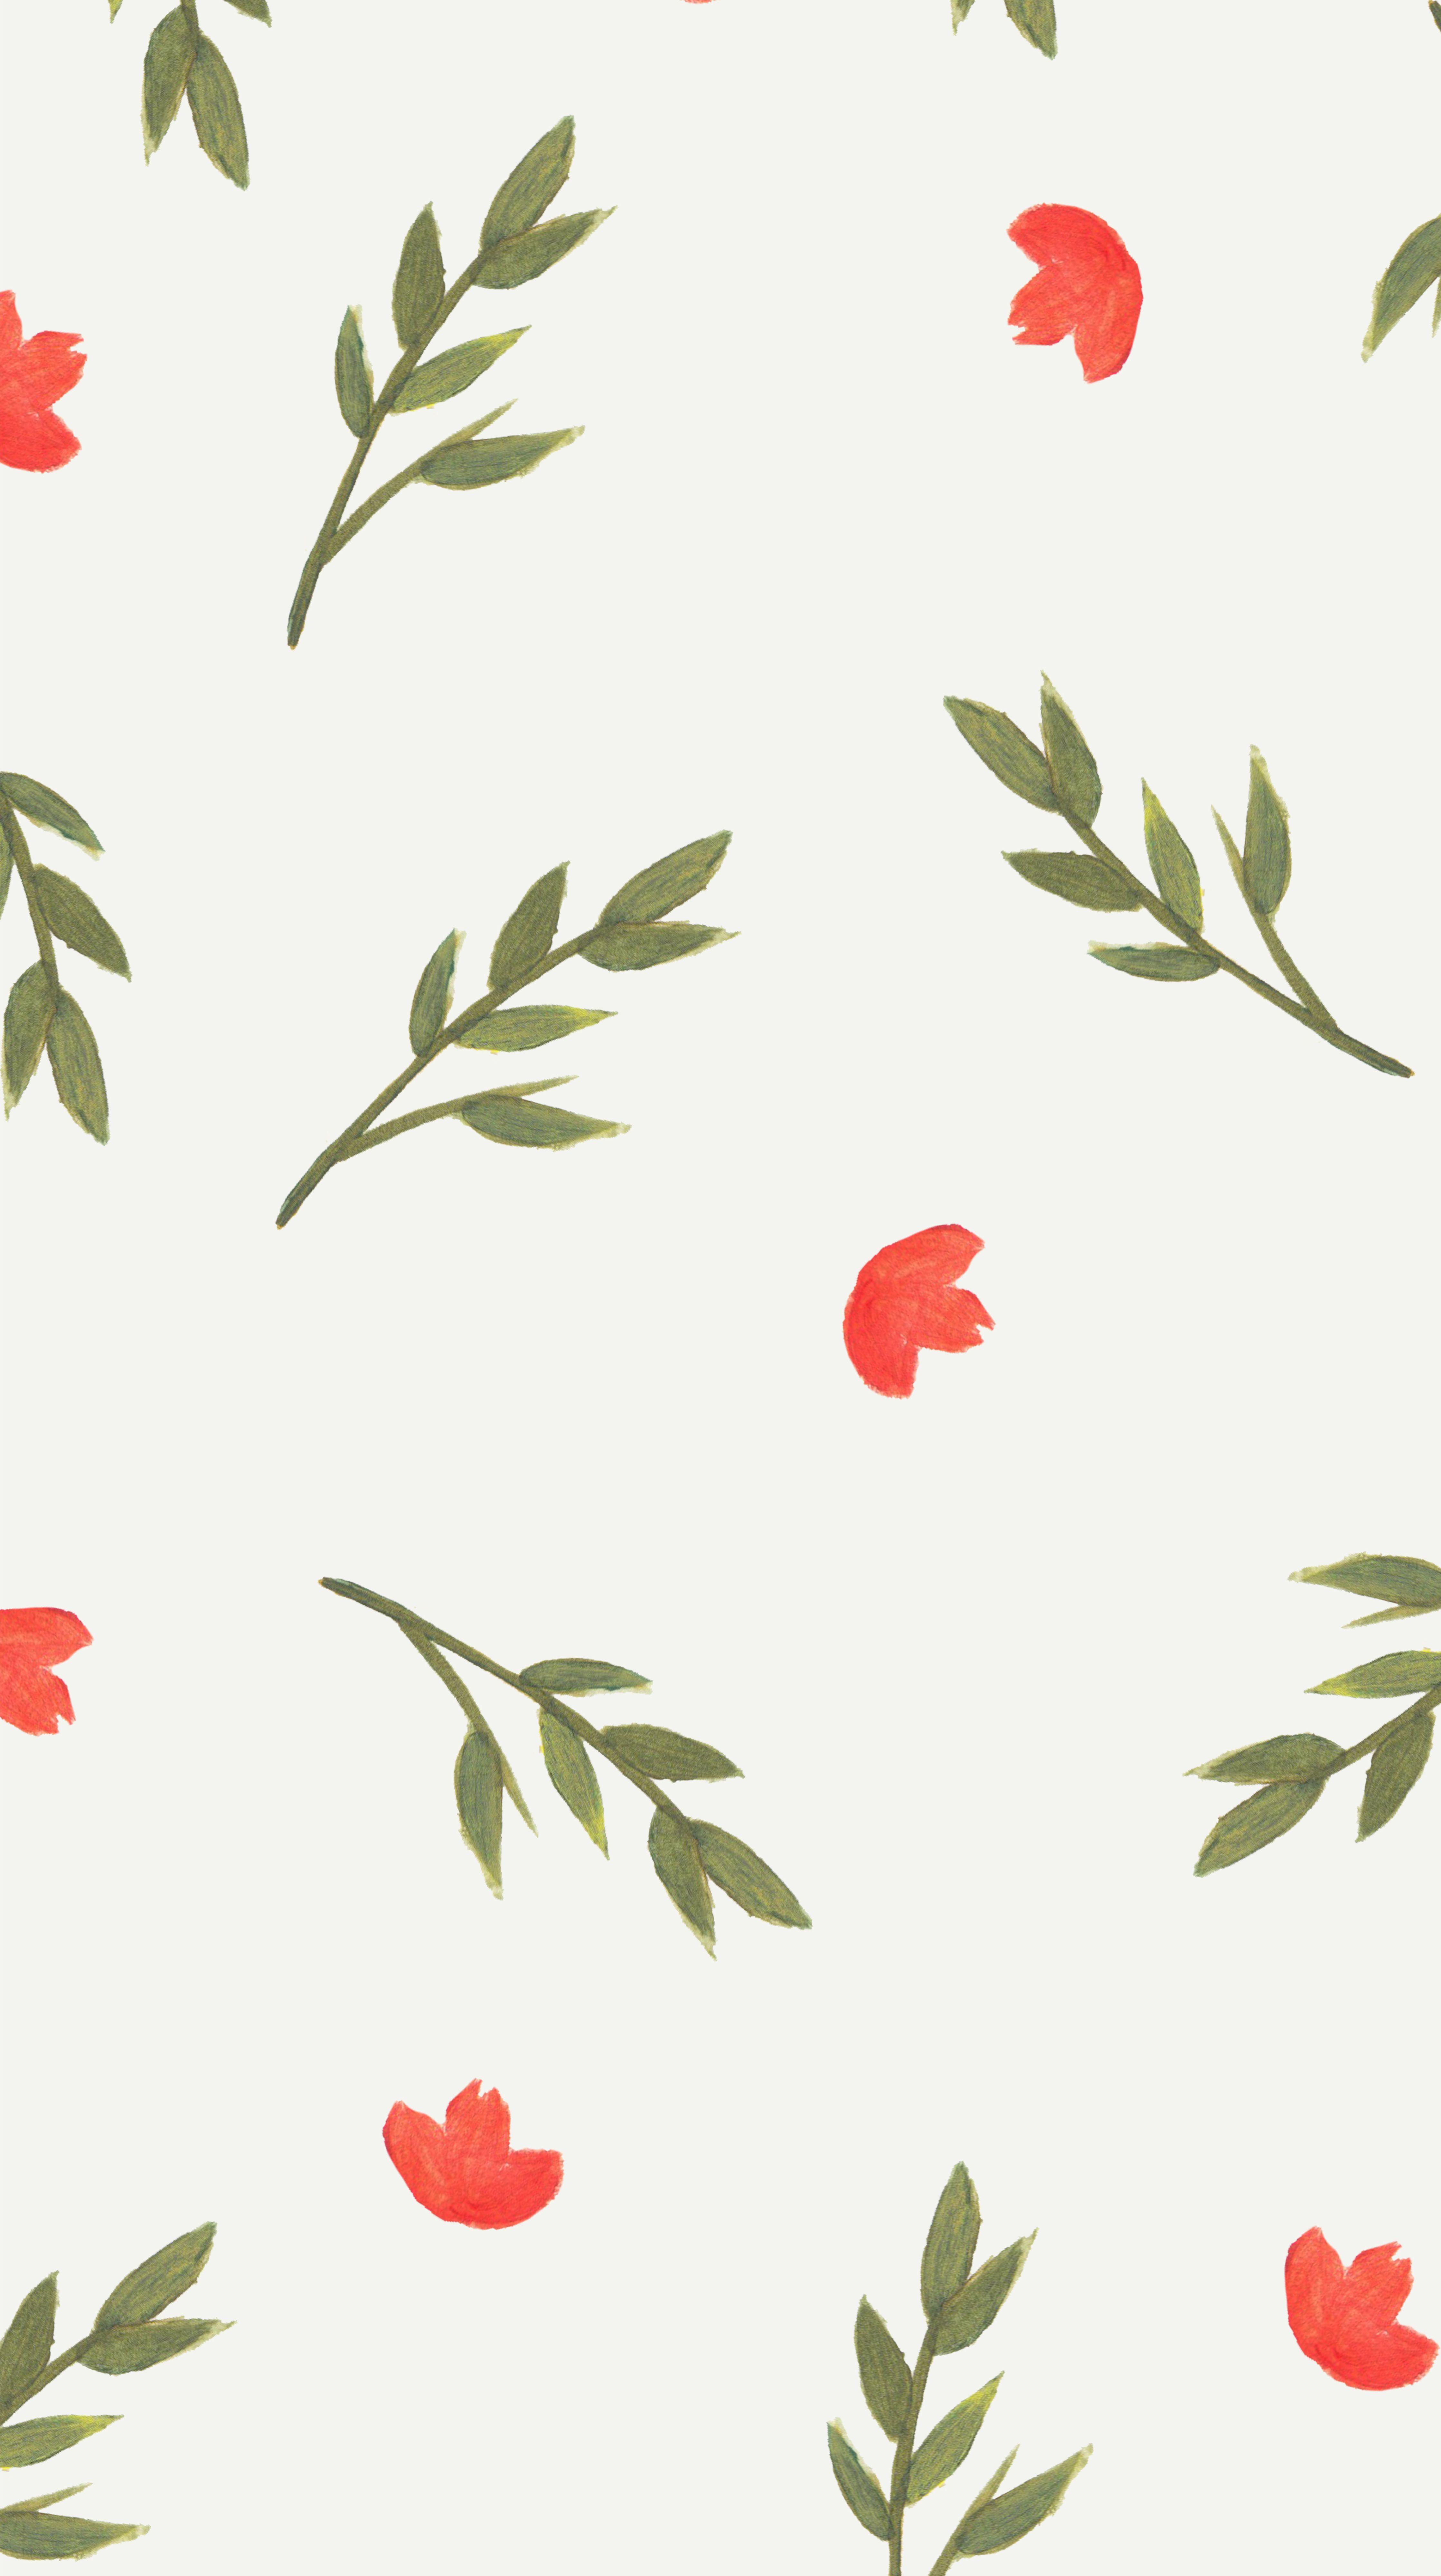 Kawaii Fond D Ecran Rose 4476x8000 Wallpaper Teahub Io